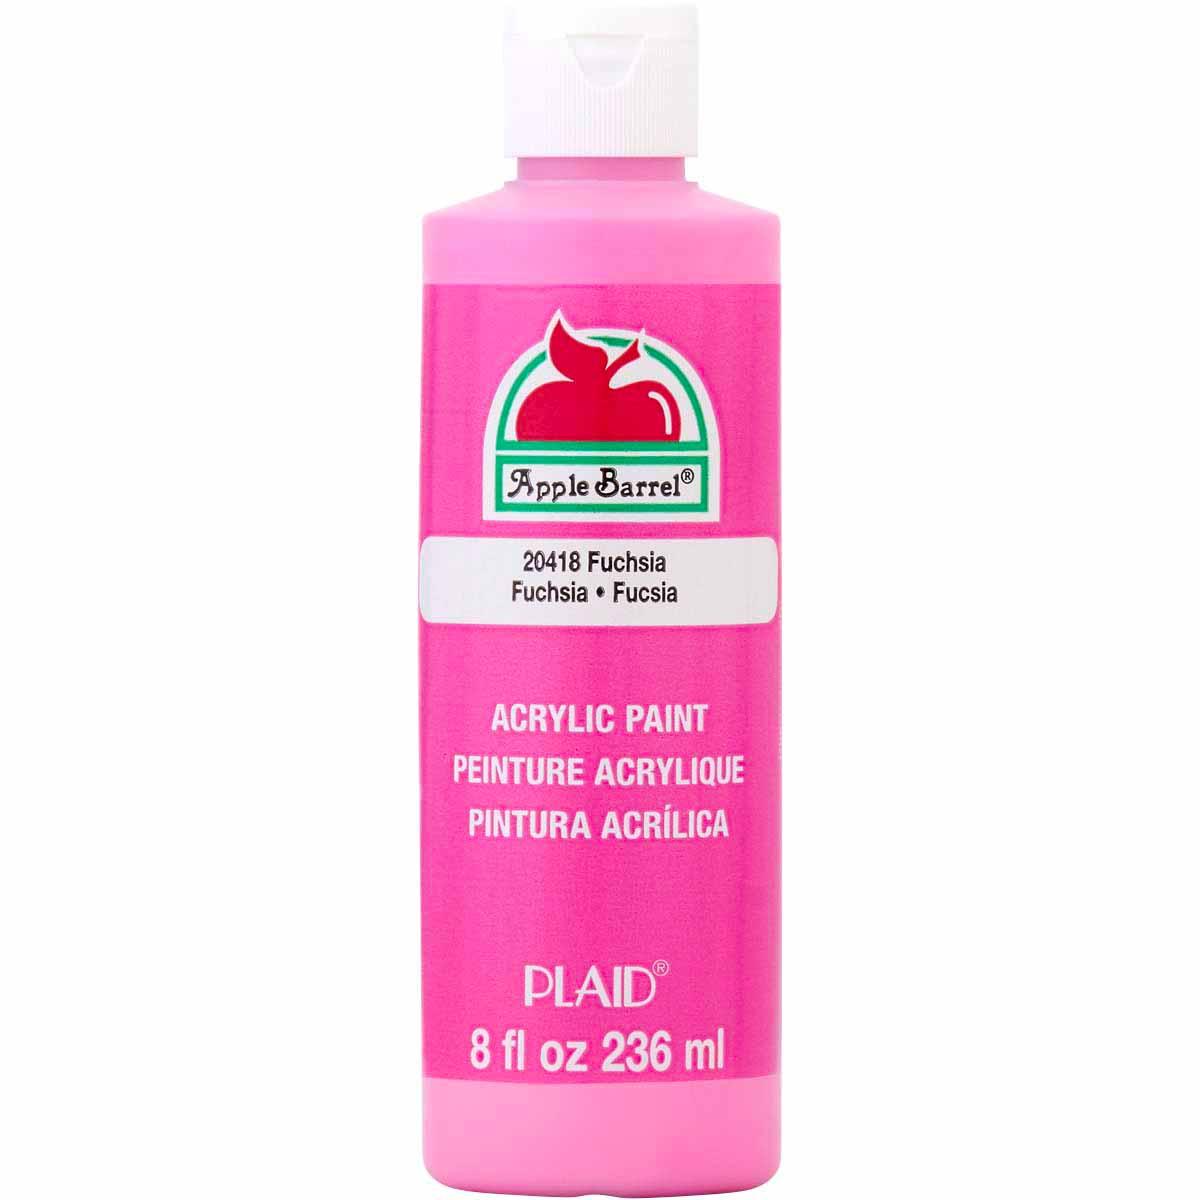 Apple Barrel ® Colors - Fuchsia, 8 oz. - 20418